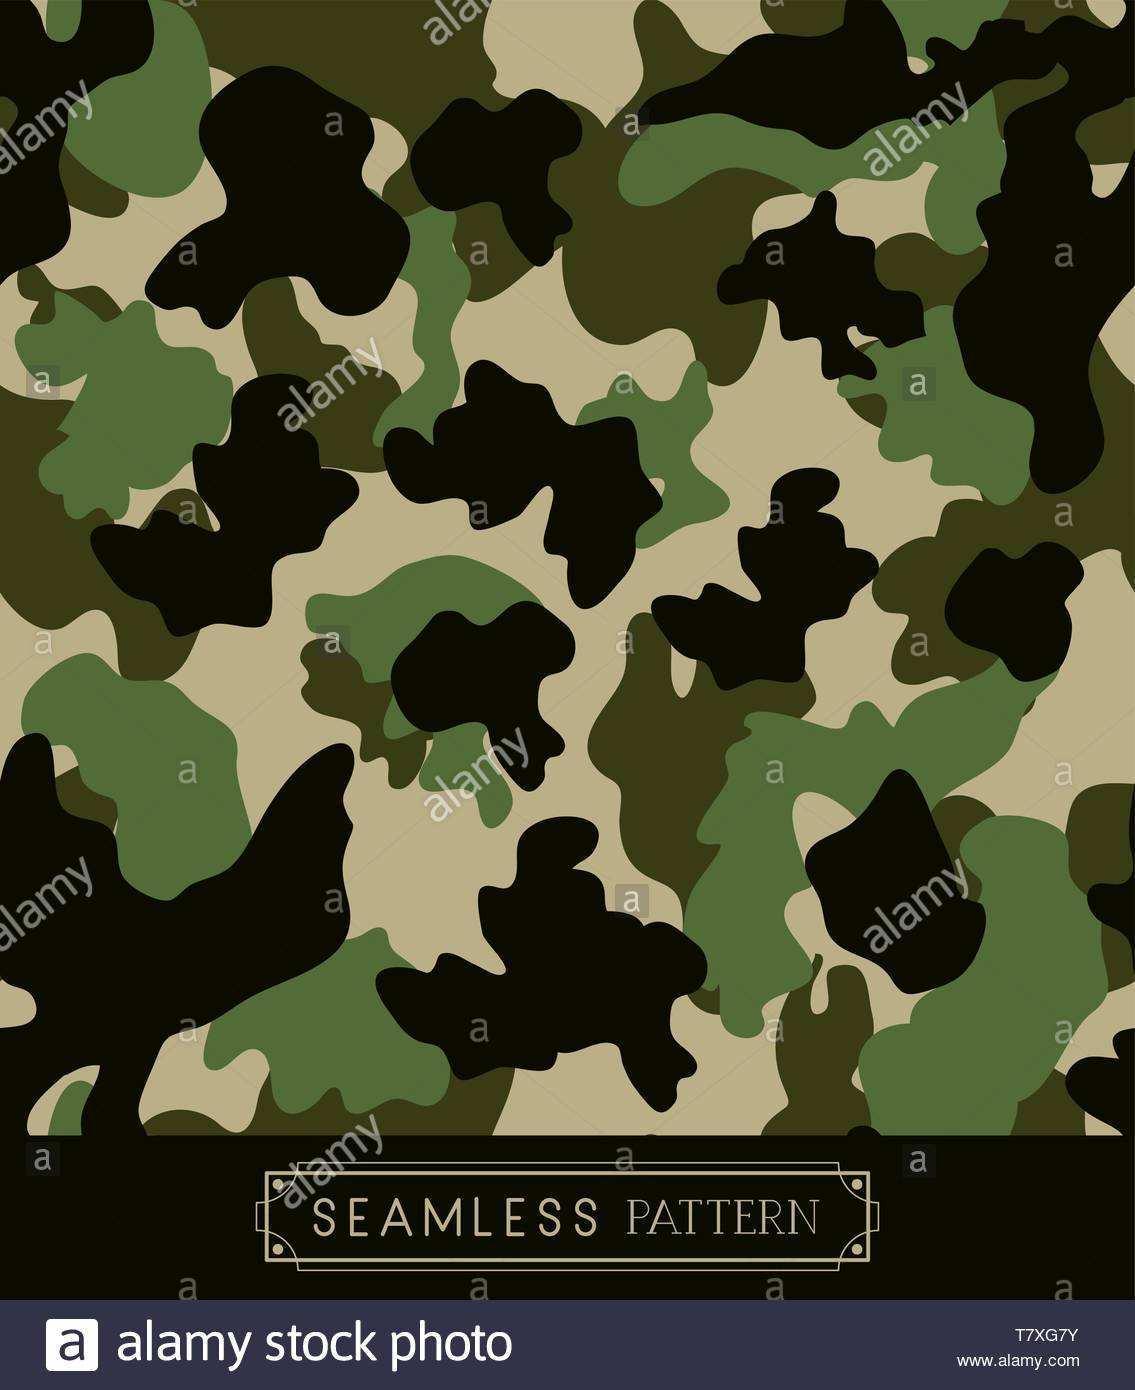 Military Camouflage Muster Hintergrund Stock Vektorgrafik Alamy